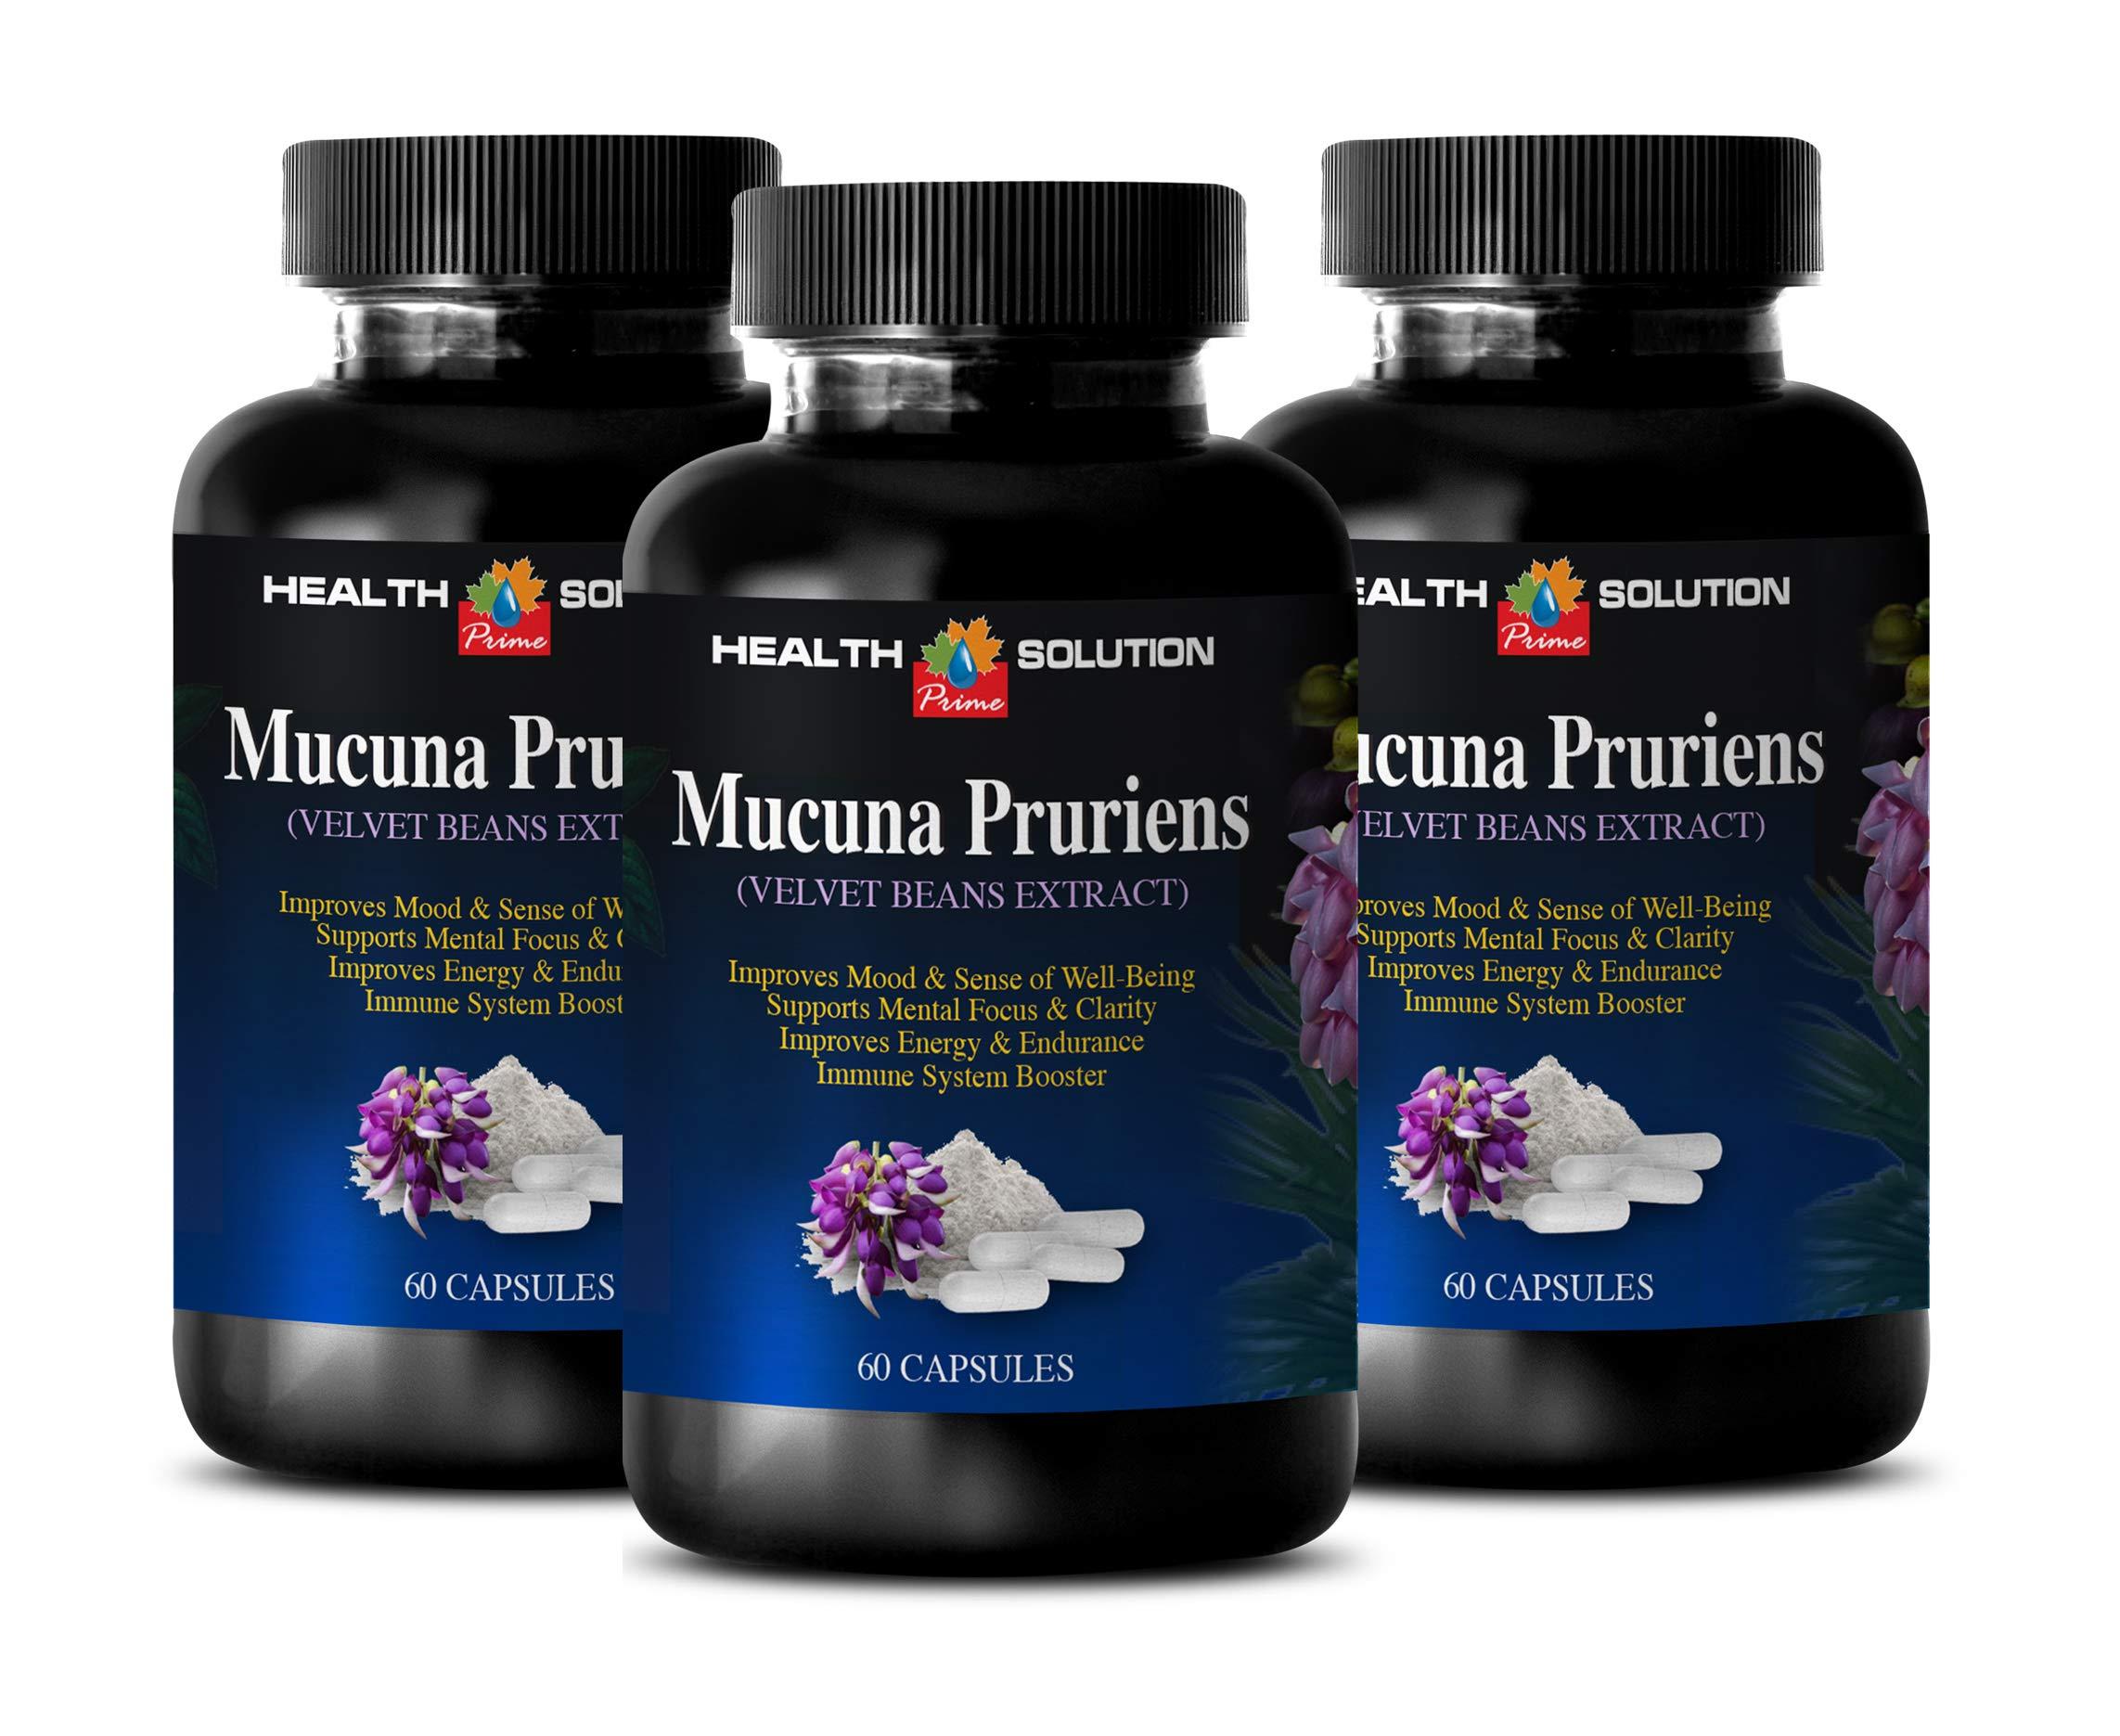 libido Booster for Men Natural - MUCUNA PRURIENS - Velvet Beans Extract - antioxidant Vitamins for Men - 3 Bottles 180 Capsules